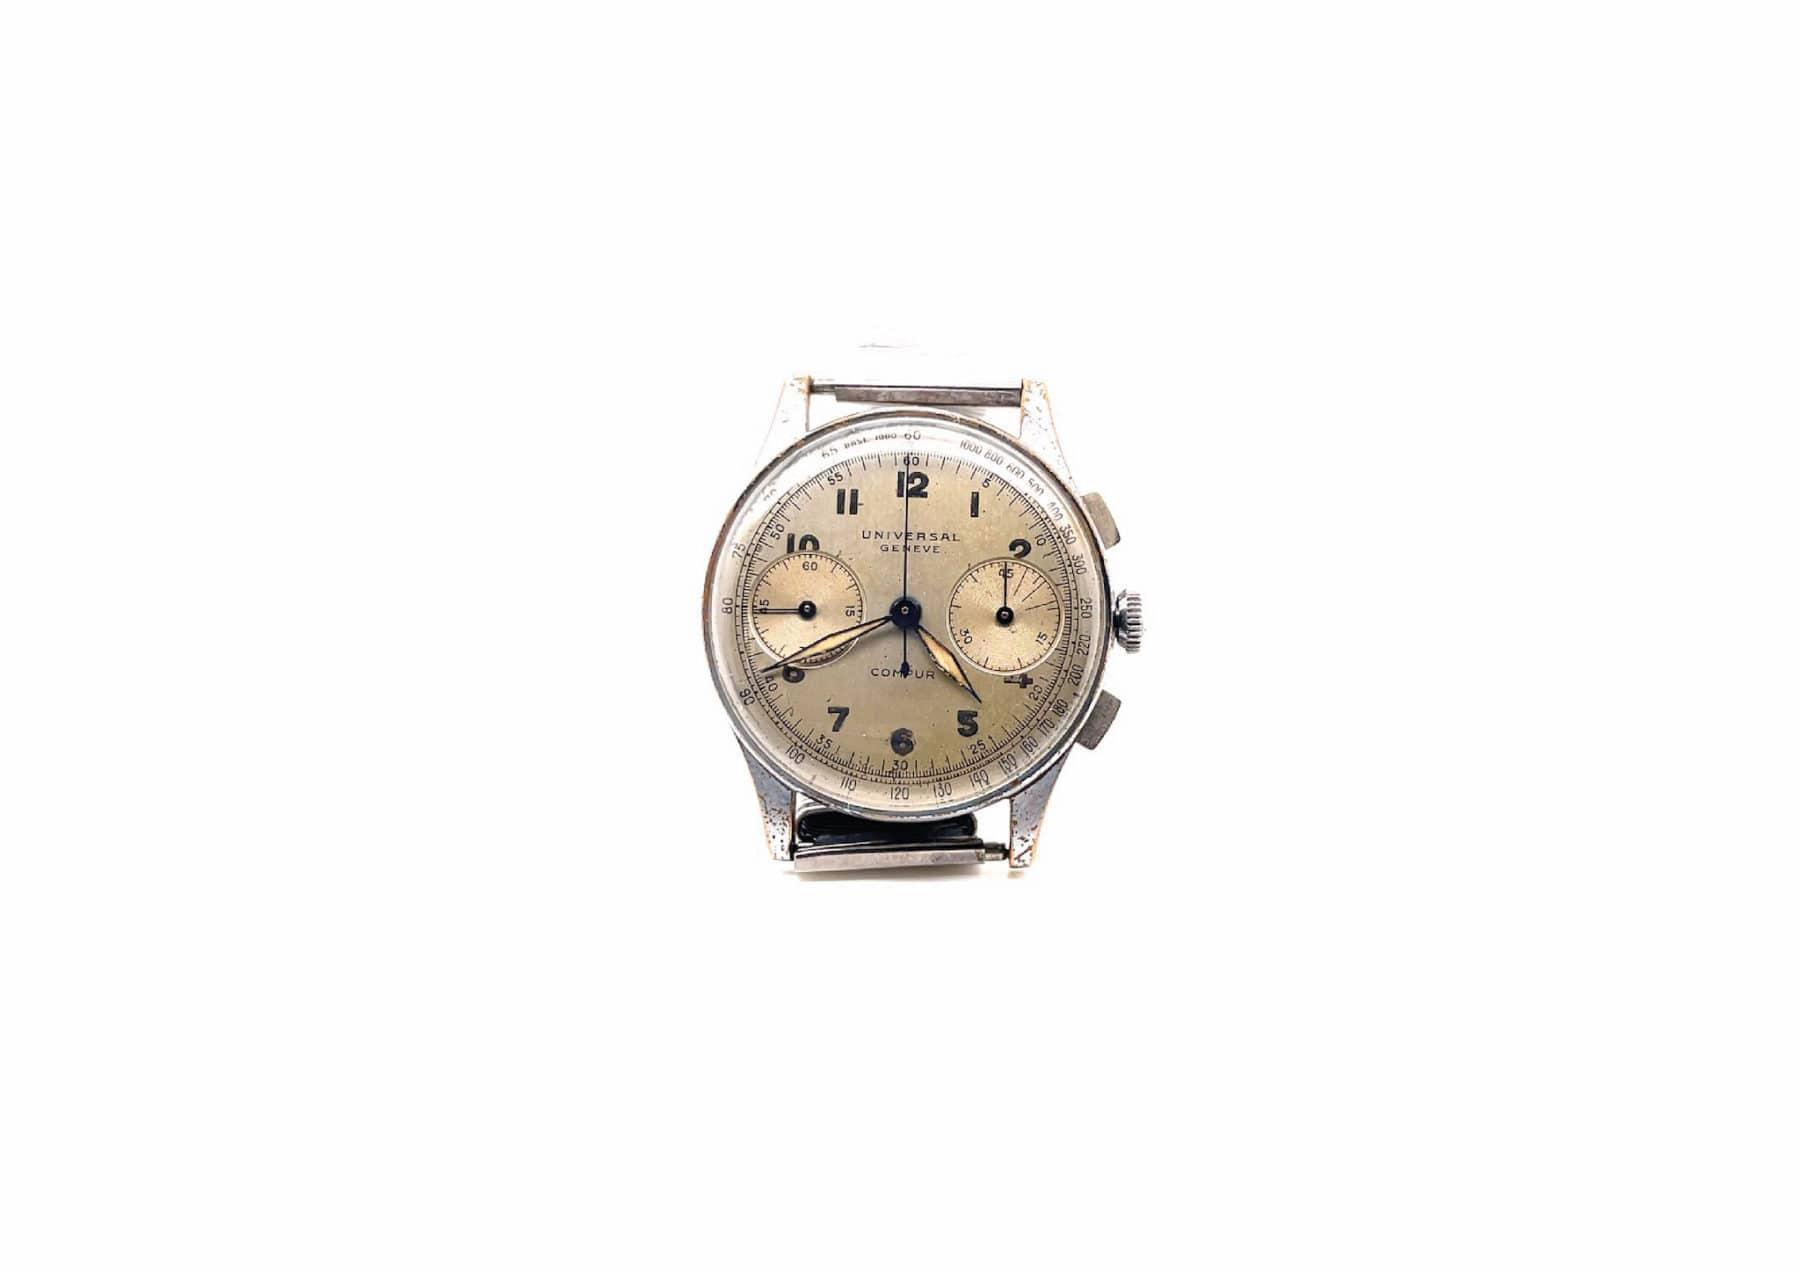 Montre vintage Universal Genève chrono 1950